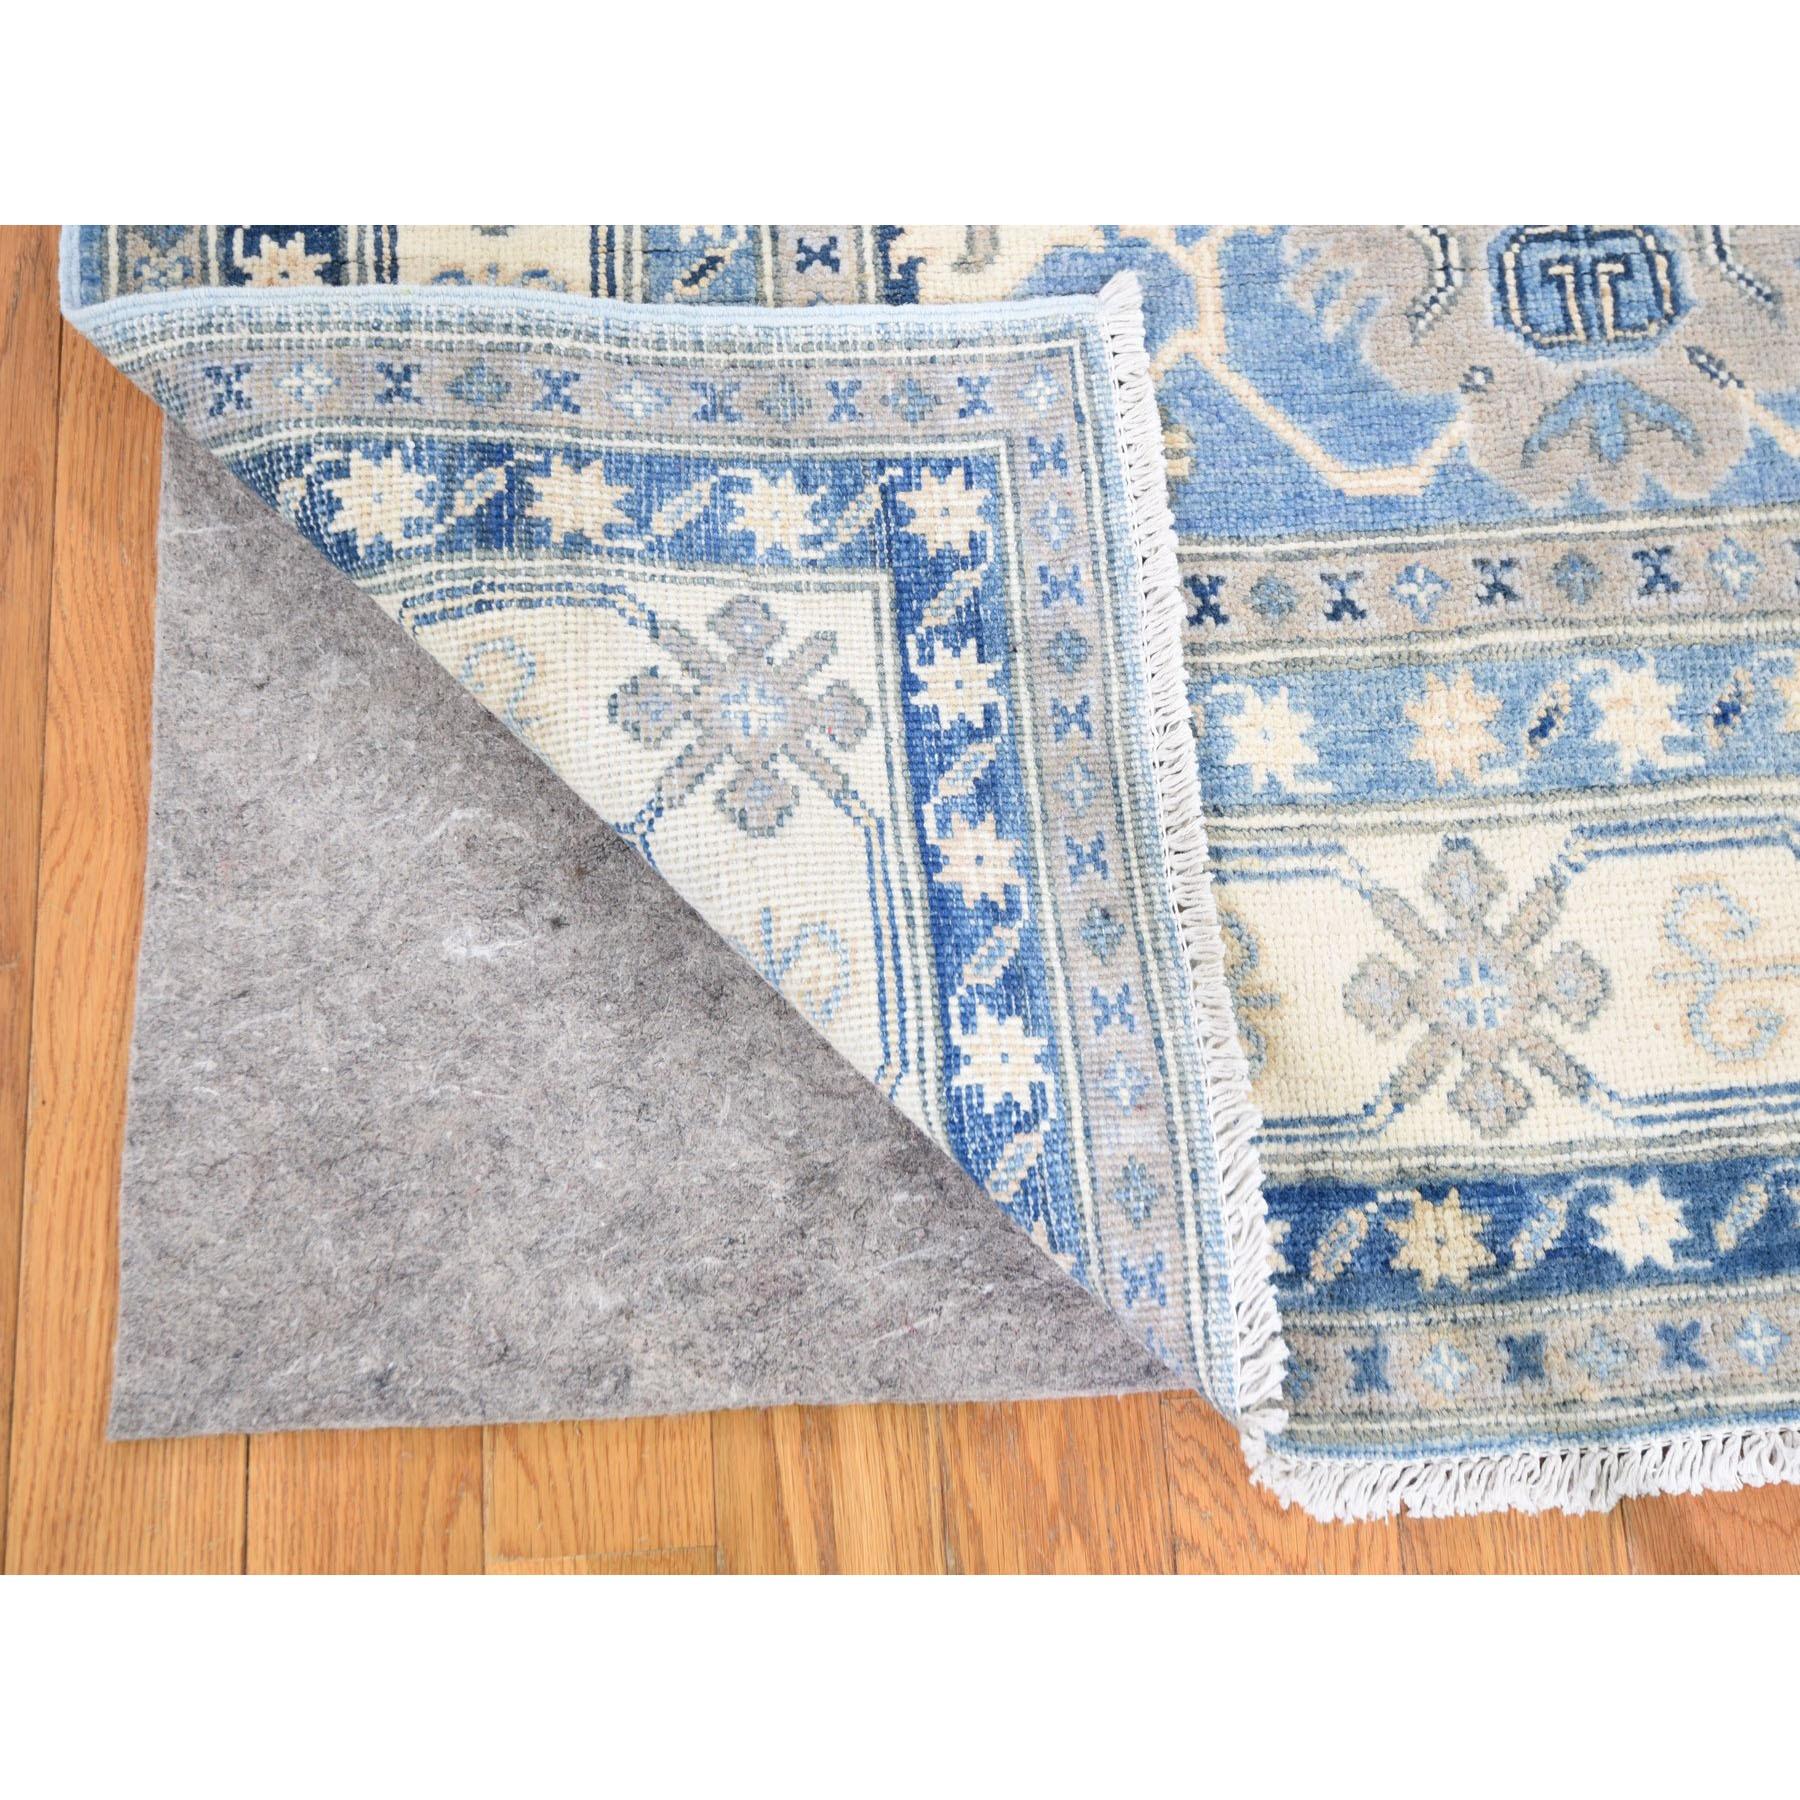 6'x9' Blue Vintage Look Kazak Geometric Design Pure Wool Hand Knotted Oriental Rug